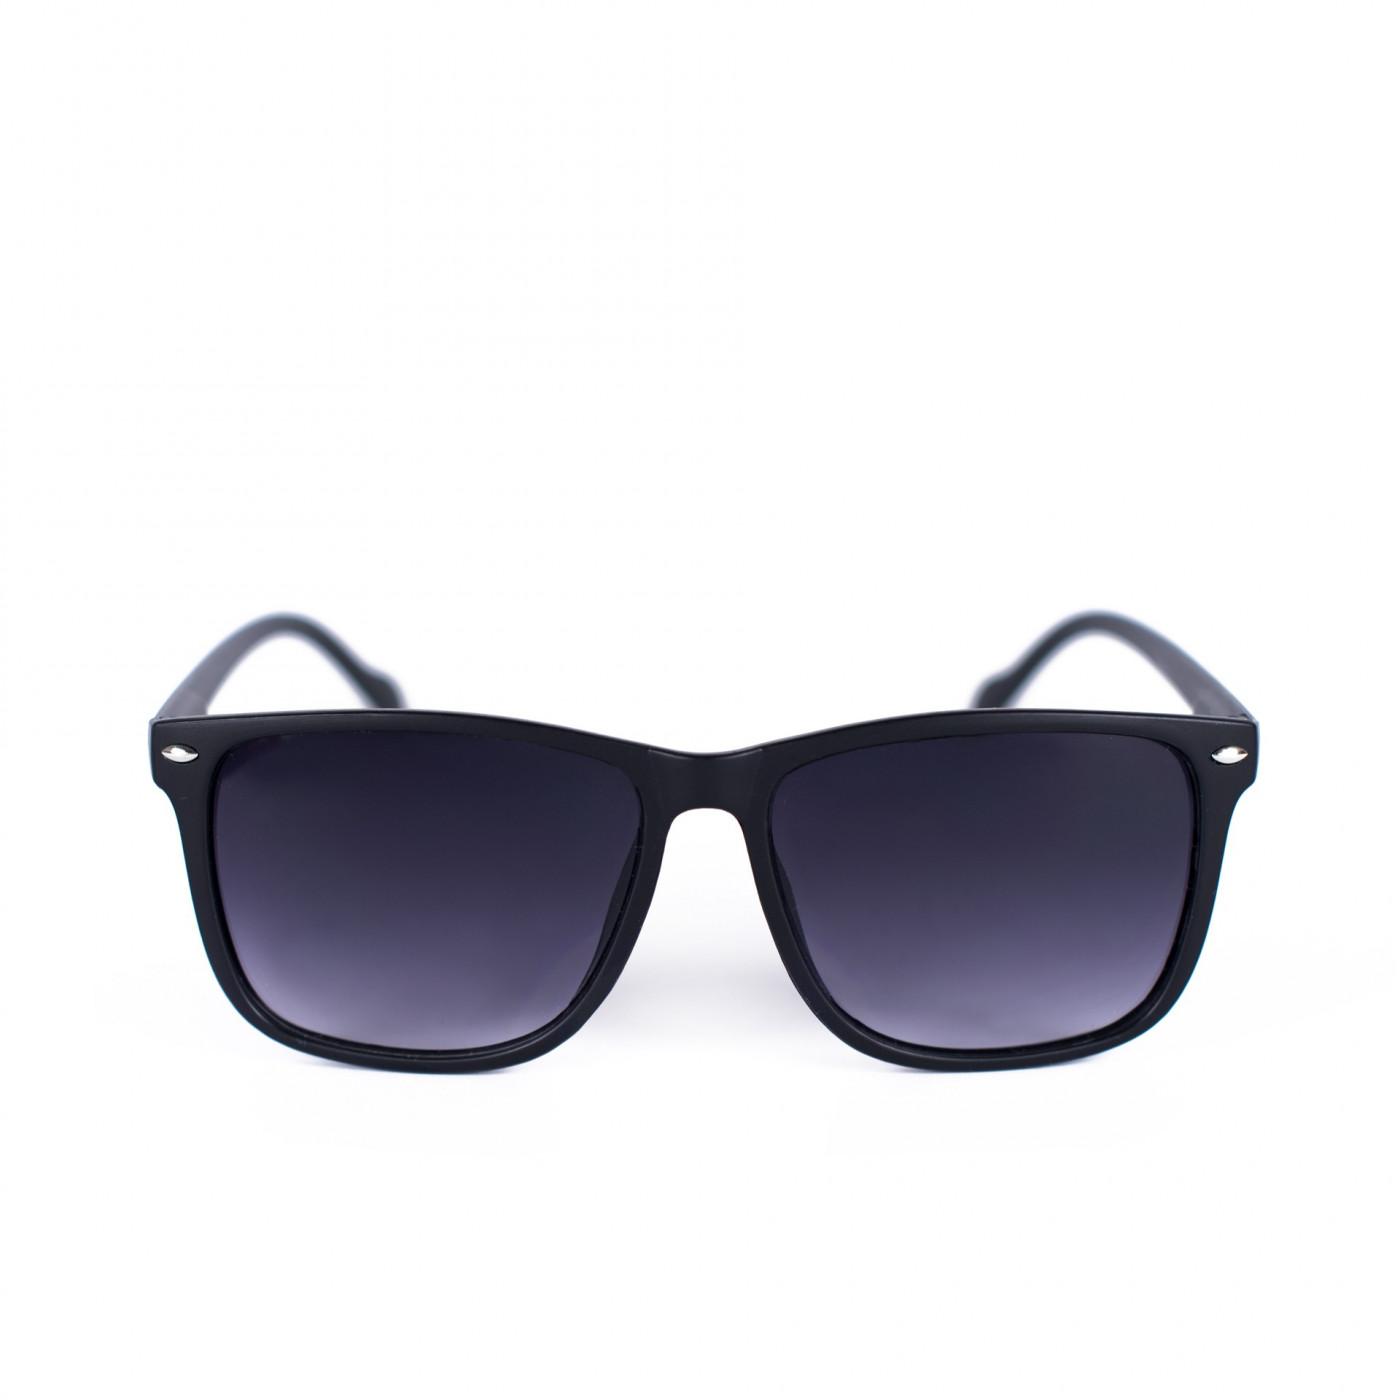 Art Of Polo Woman's Sunglasses ok19199